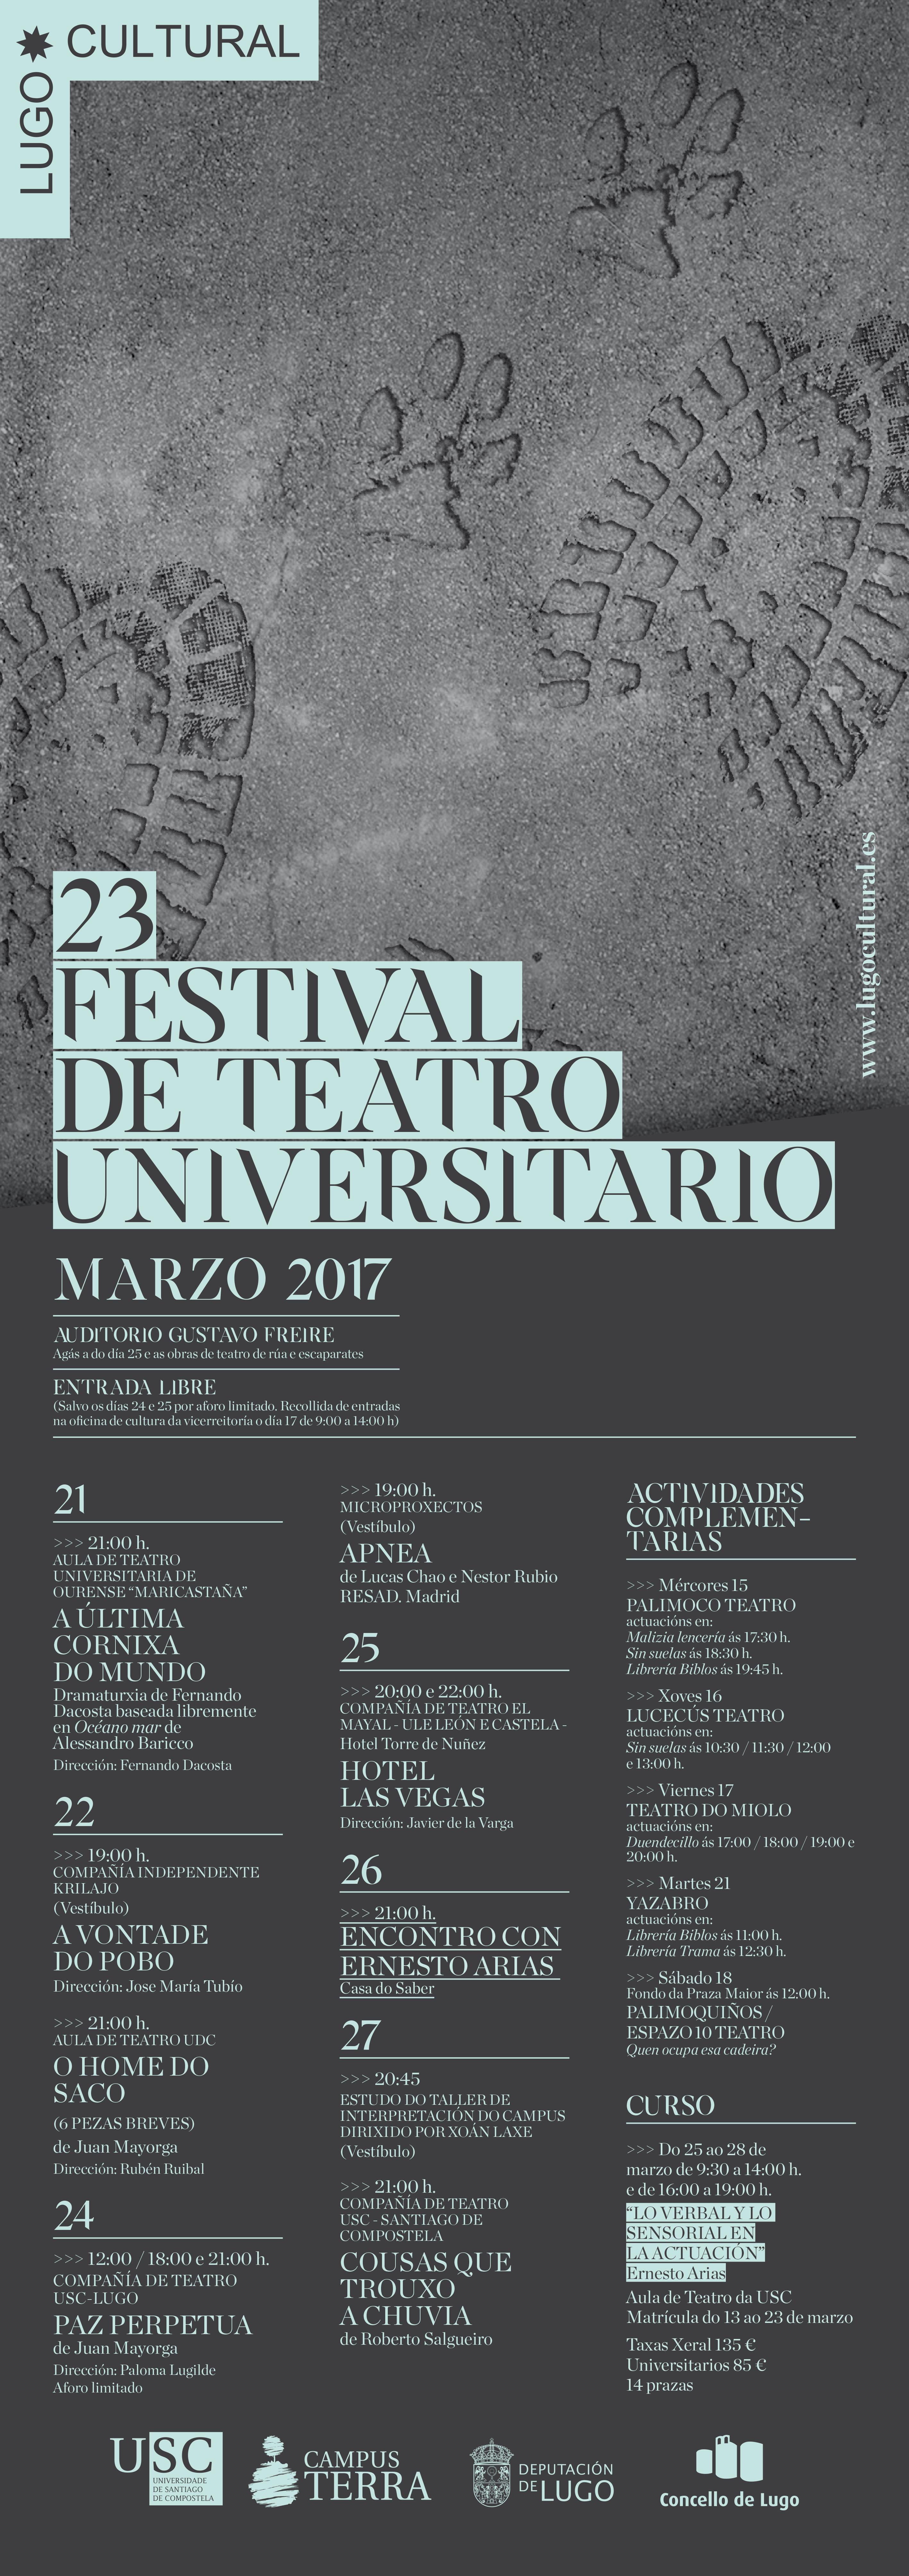 23 Festival de Teatro Universitario da USC 2017